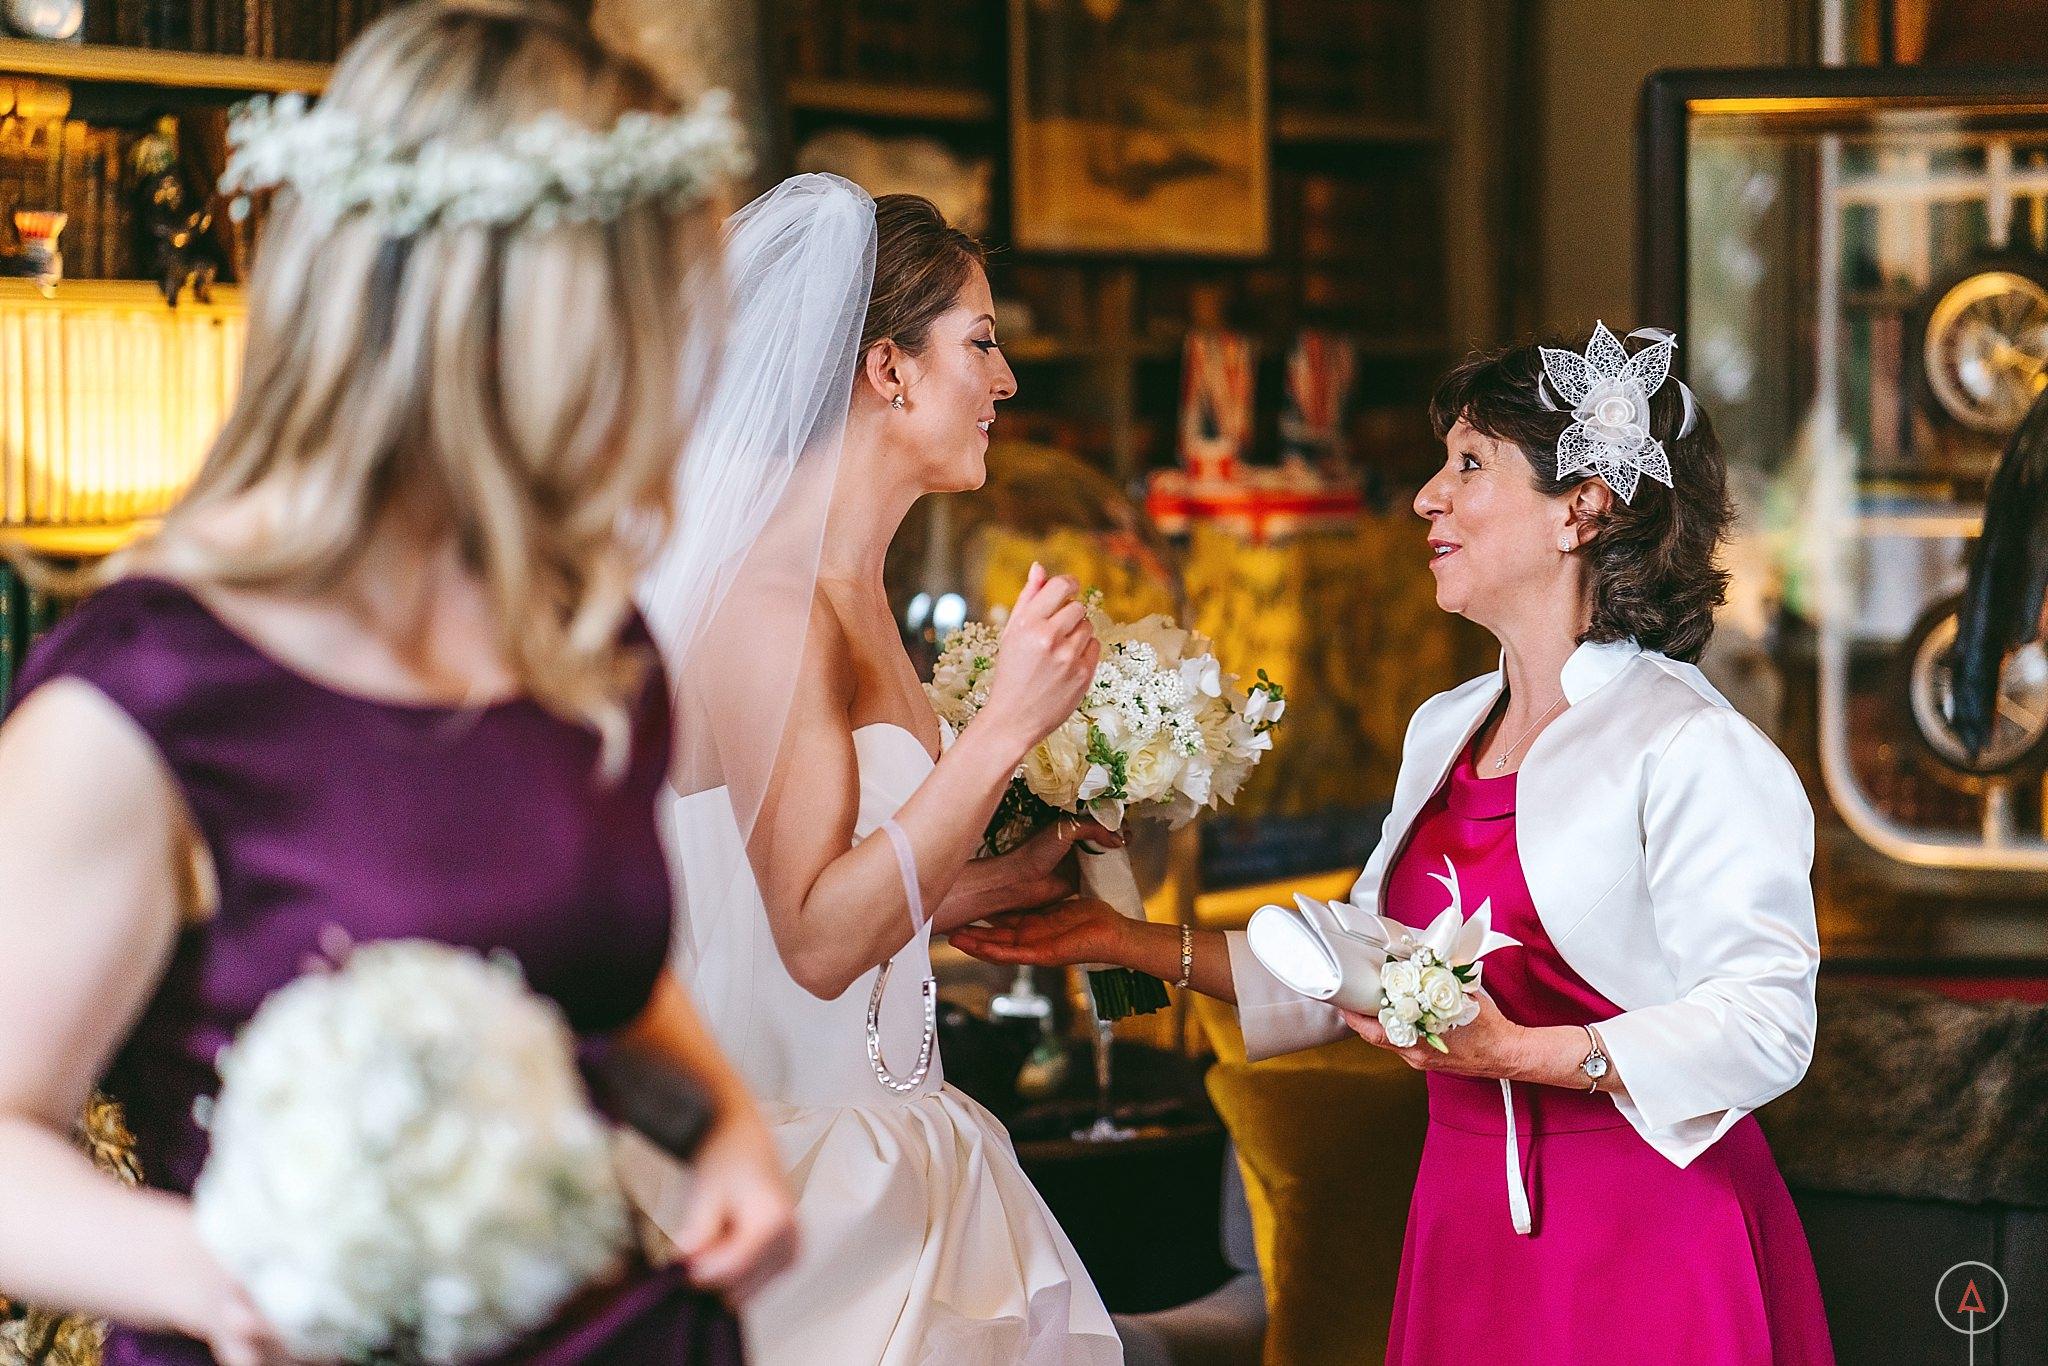 cardiff-wedding-photographer-aga-tomaszek_0280